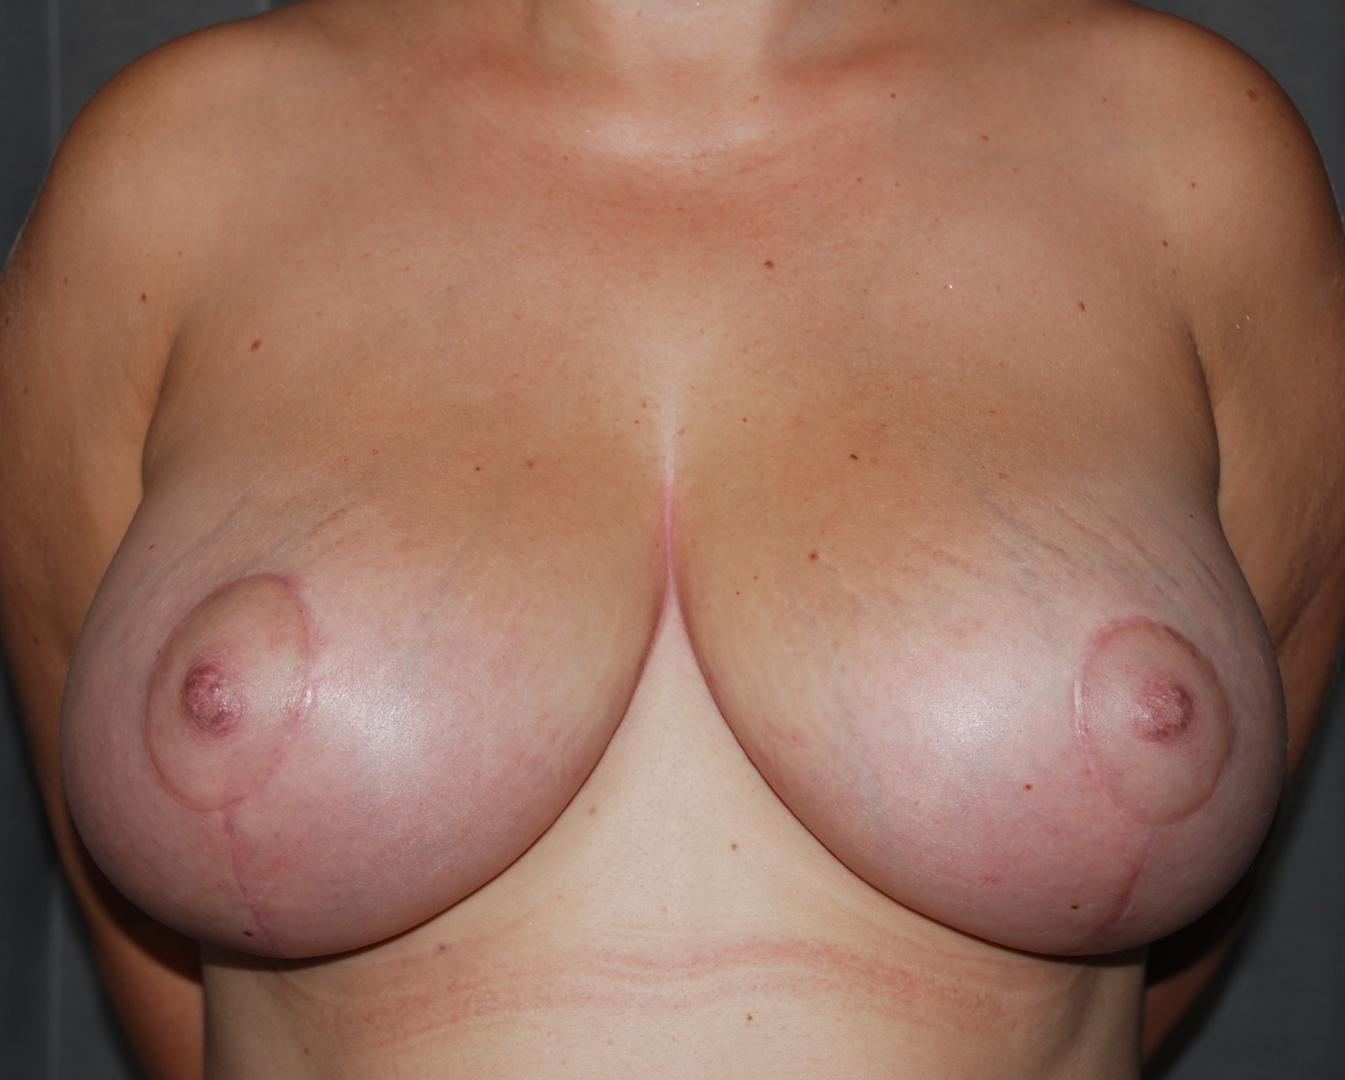 breast uplift Kims hospital oliver harley